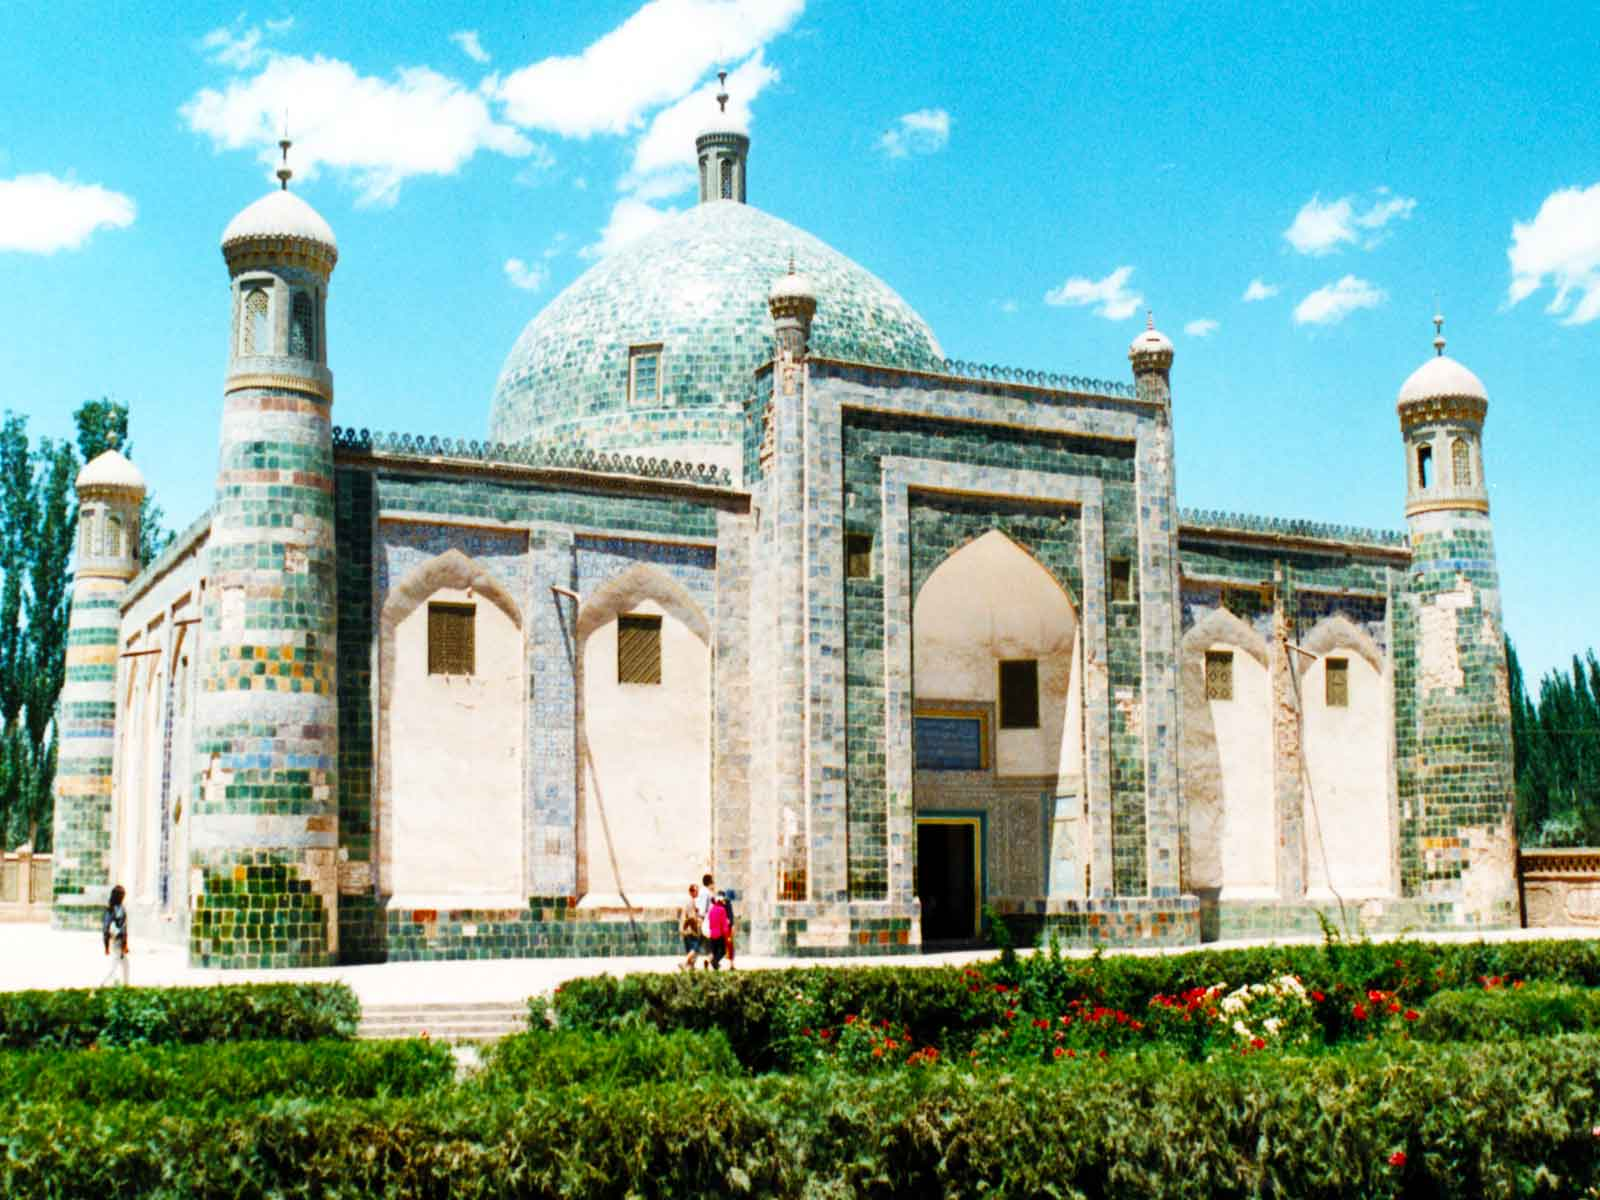 Afaq Khoja Mausoleum 1640 - Silk Road Photo Journal - University of Hawaii China Study Tour - Steven Andrew Martin